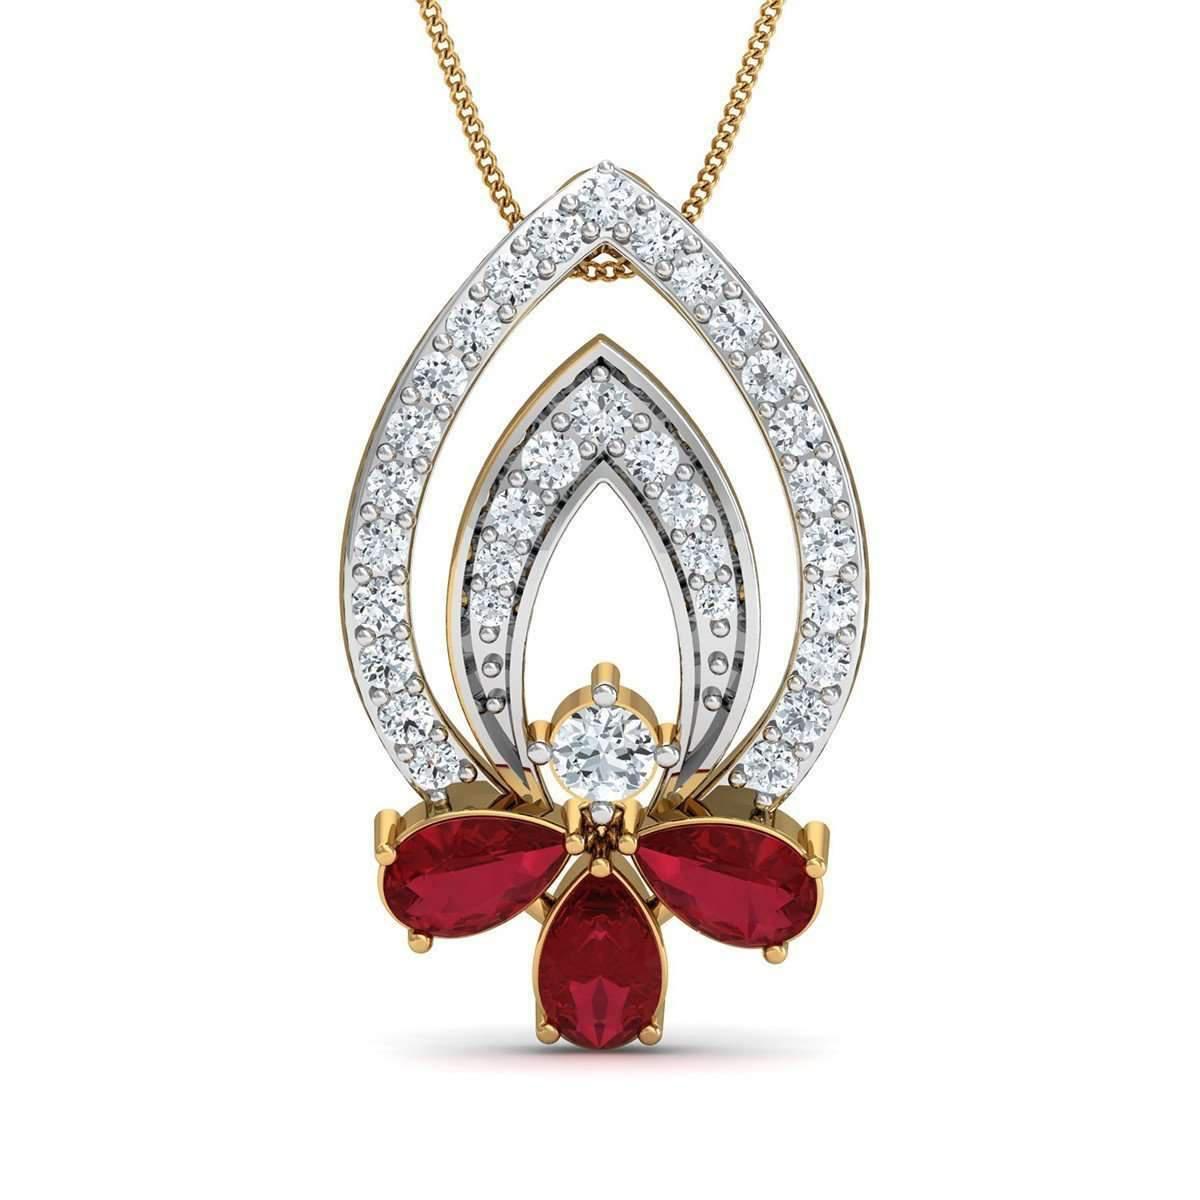 Diamoire Jewels Finest 18kt Yellow Gold and Premium Diamond Pave Set Pendant ZuOt078vxV